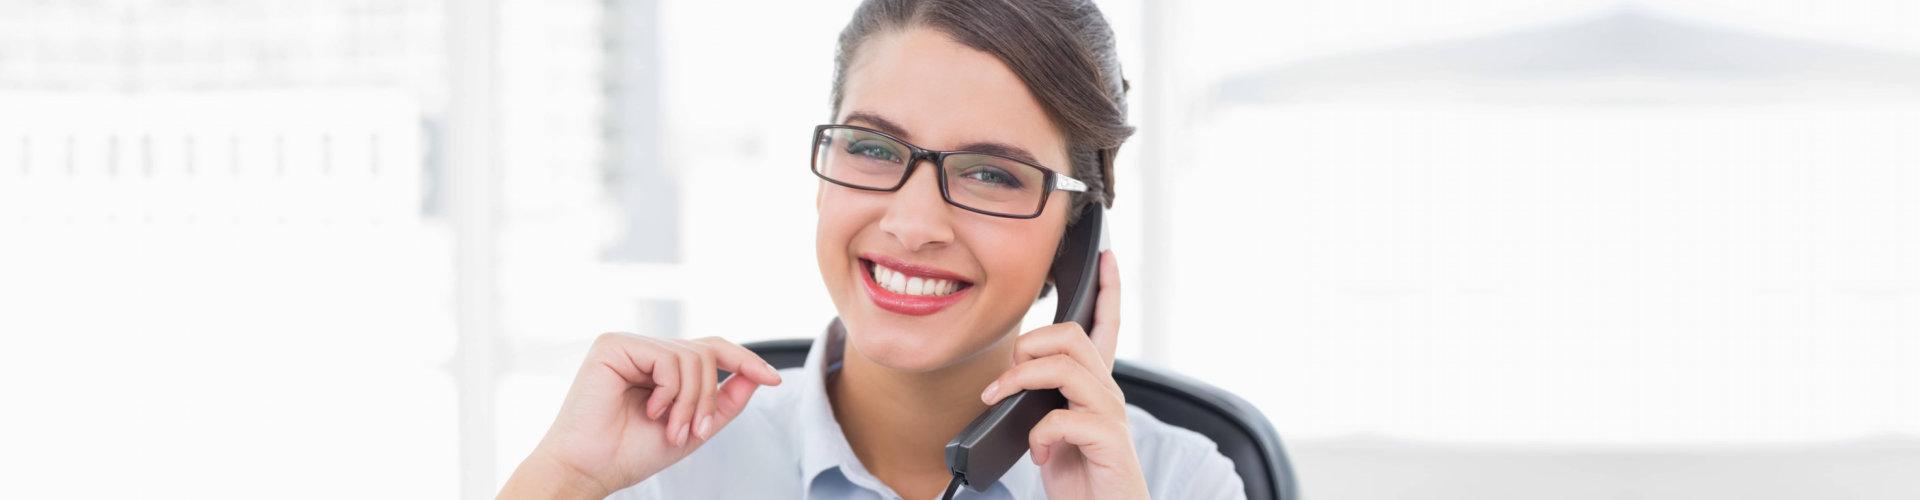 staff using the telephone